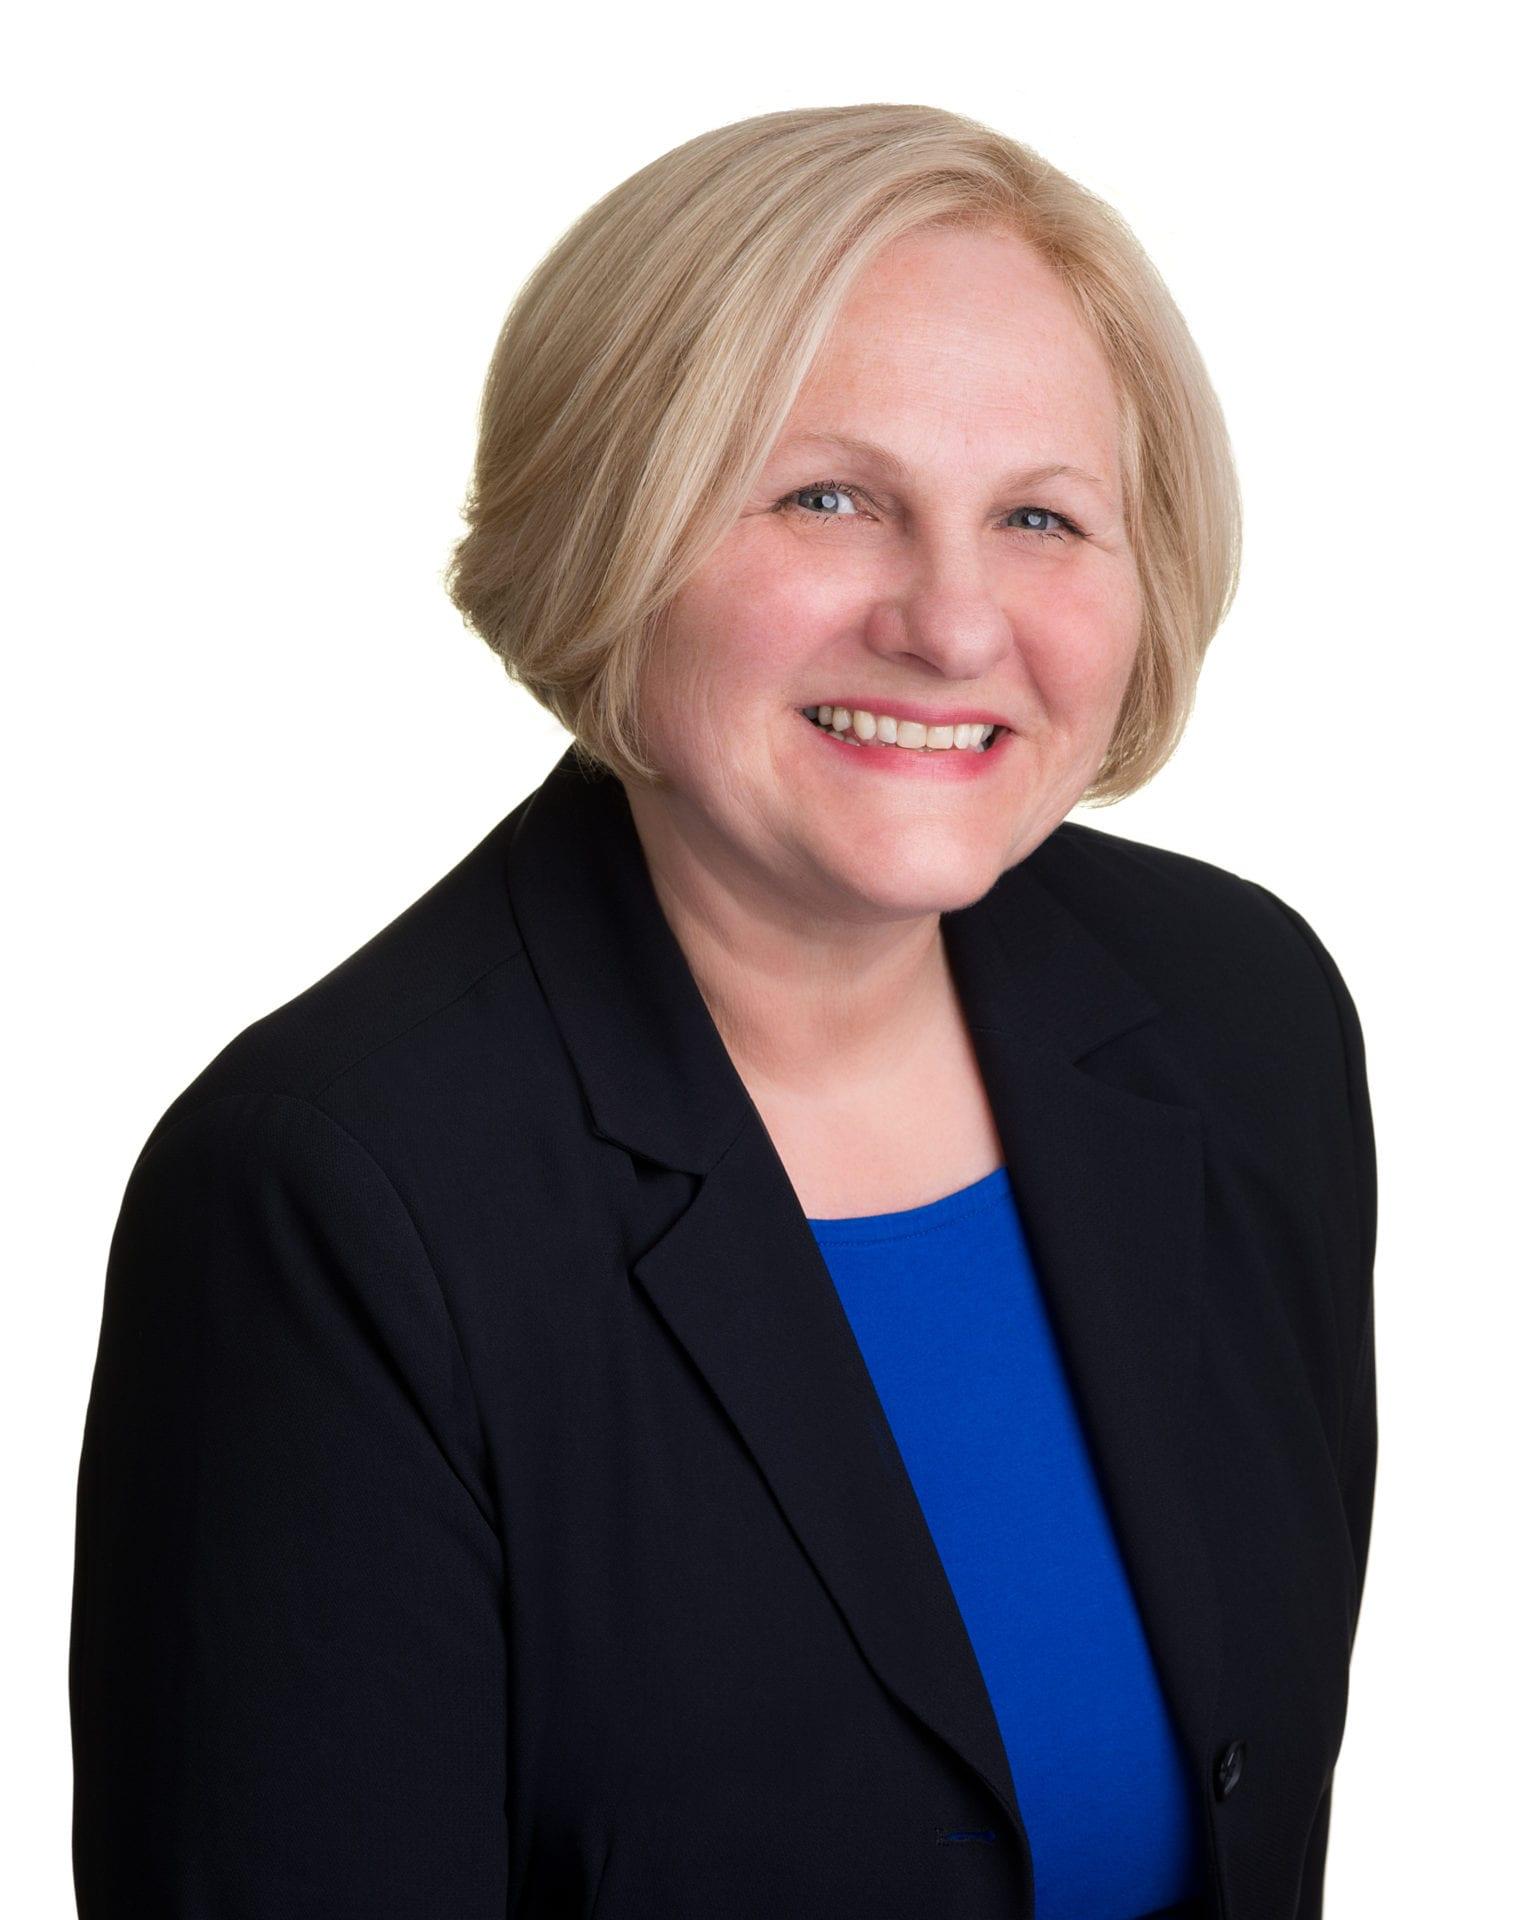 Deborah Savoy